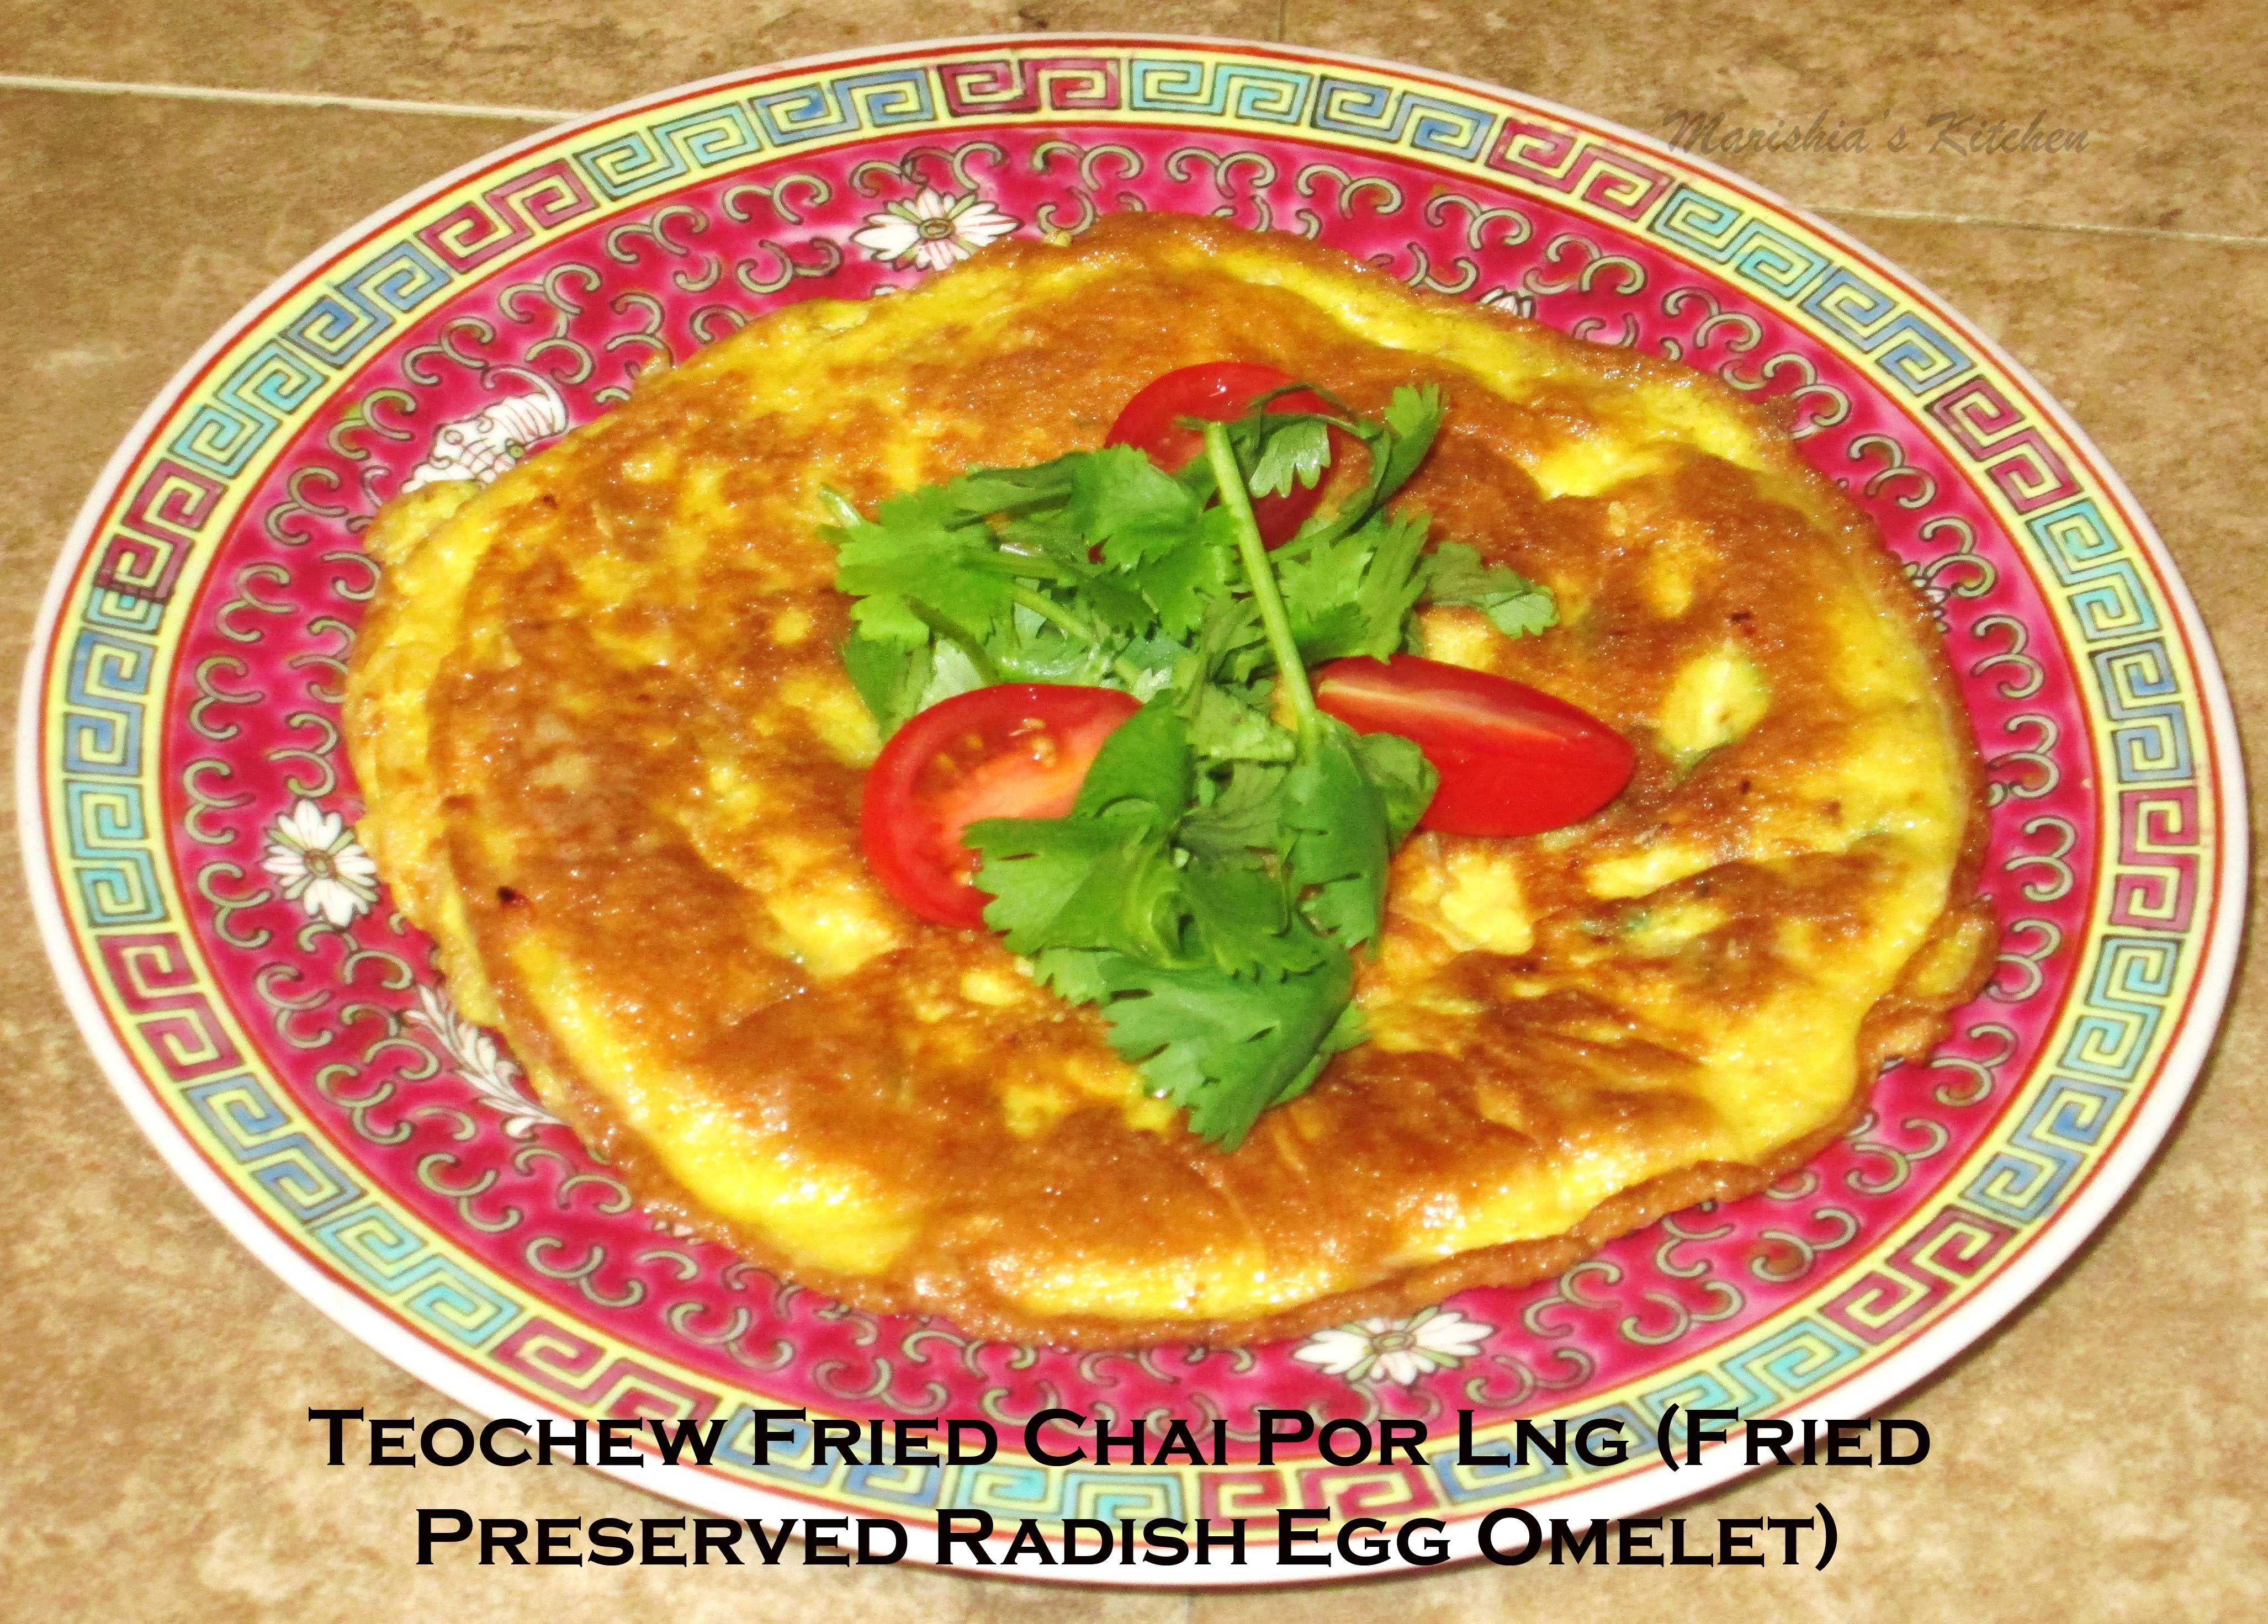 Teochew Fried Chai Por Lng (Fried Preserved Radish Egg Omelet ...